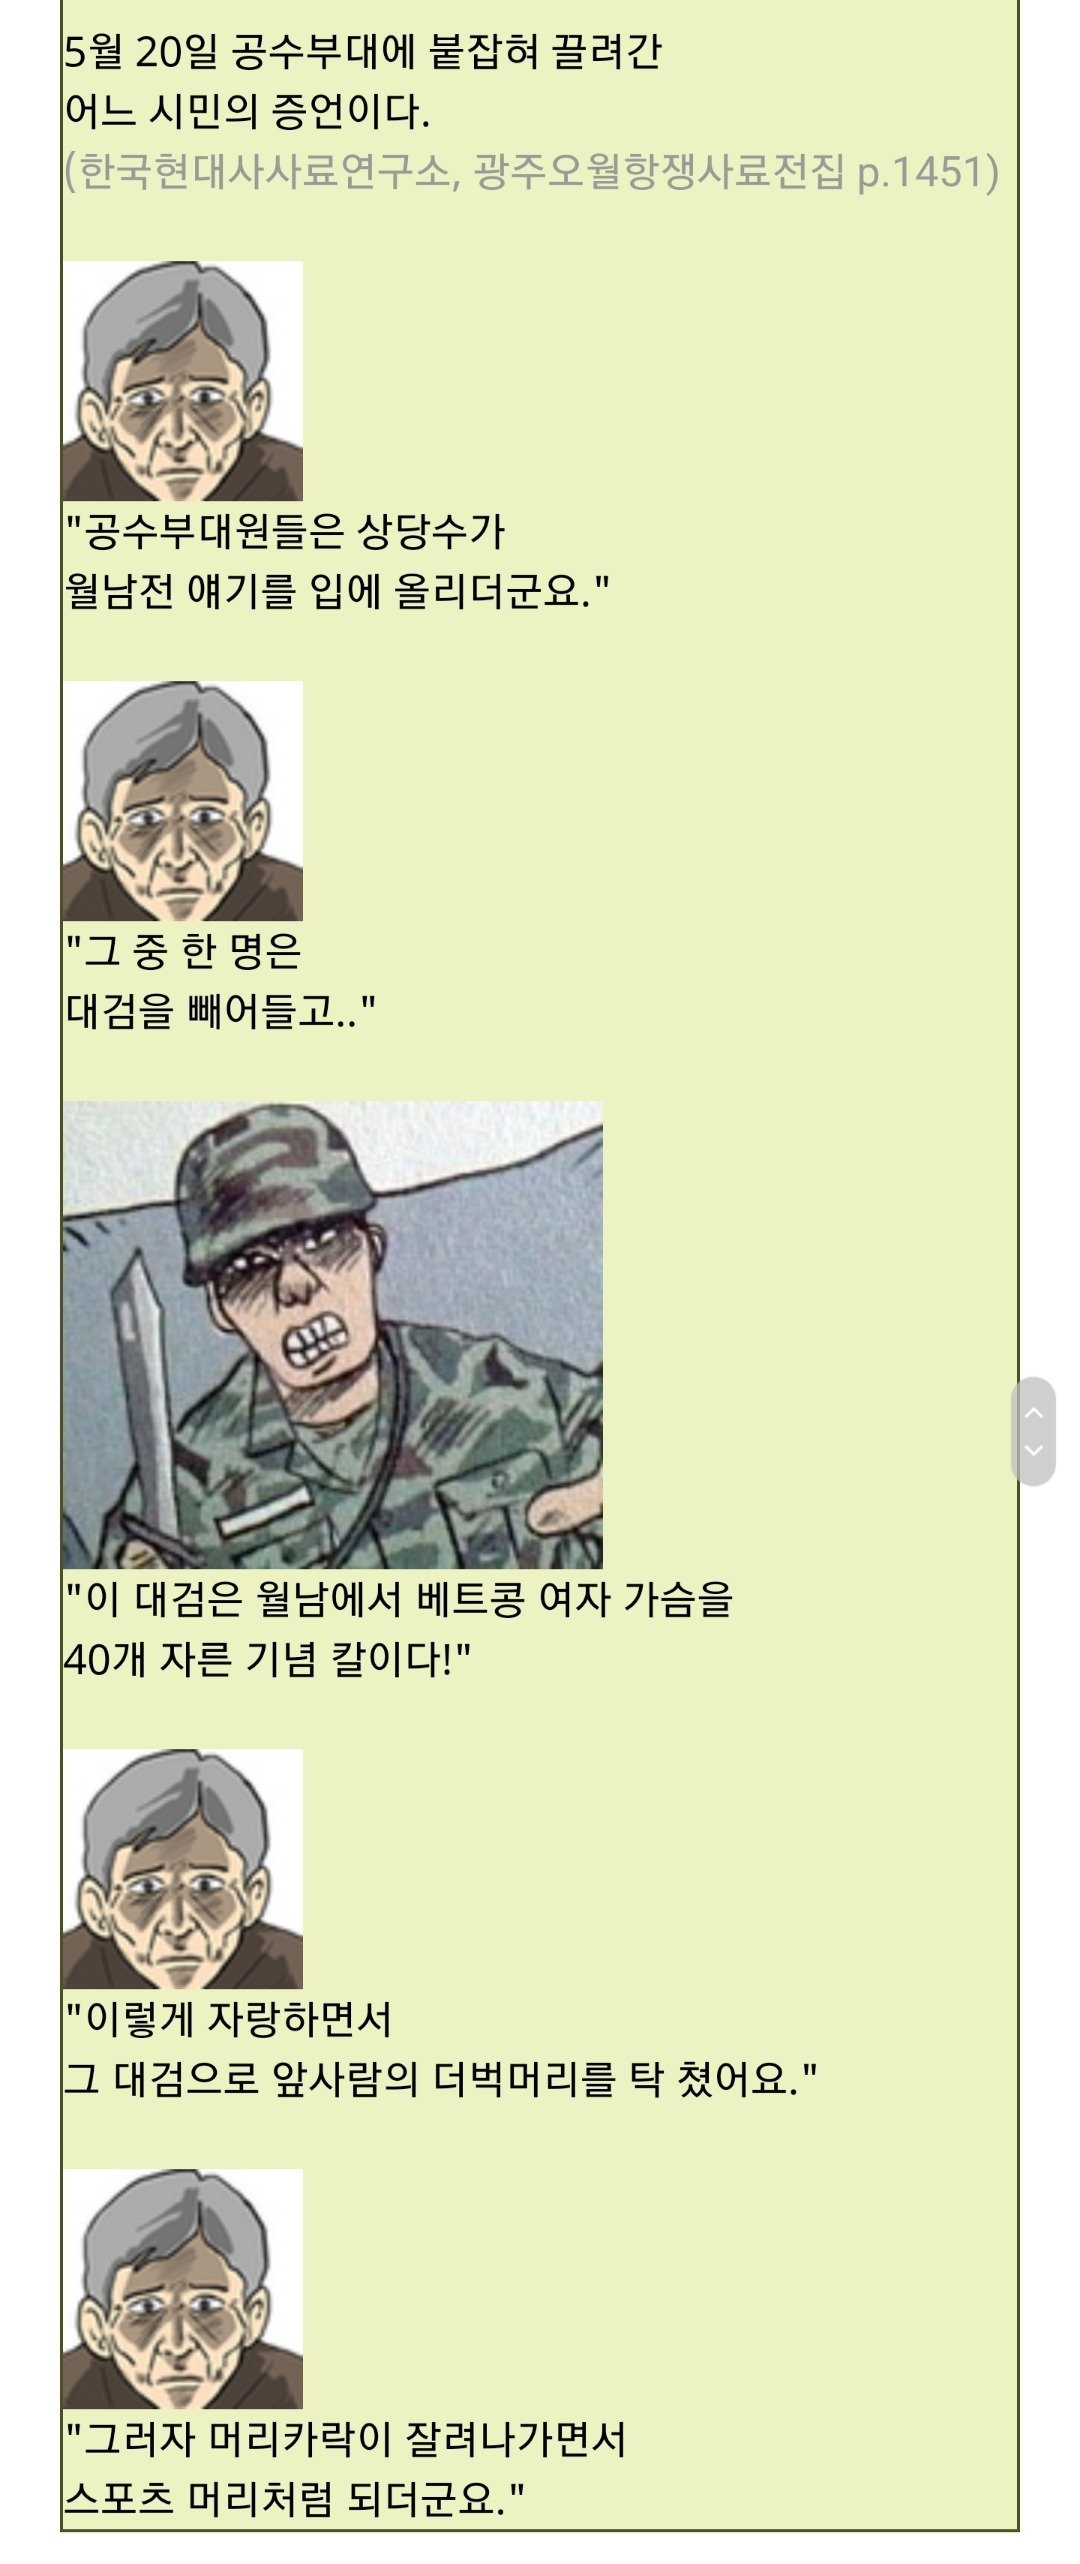 5.jpg 5.18 당시 공수부대의 잔혹한 활약상